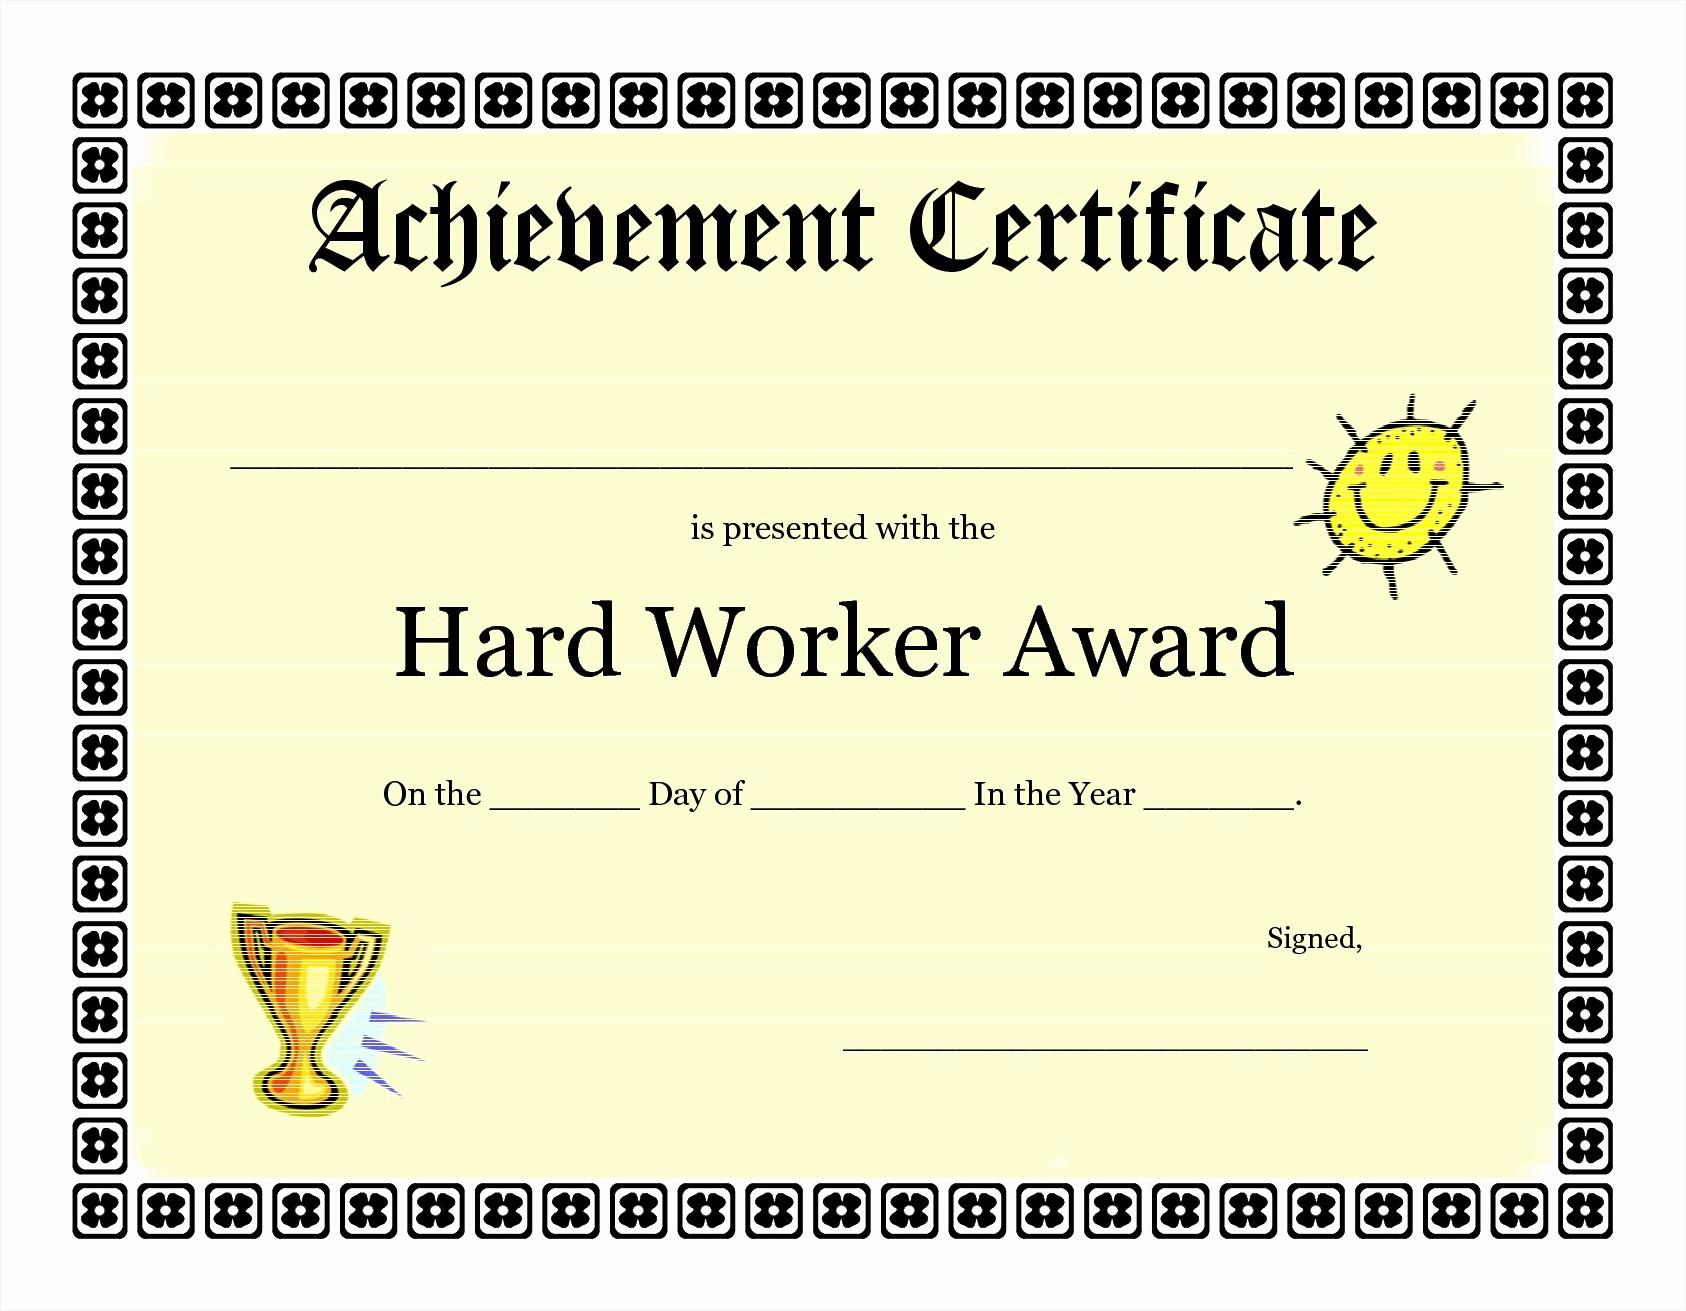 Certificate Of Achievement Free Template Luxury Achievement Certificate Templates Free Mughals